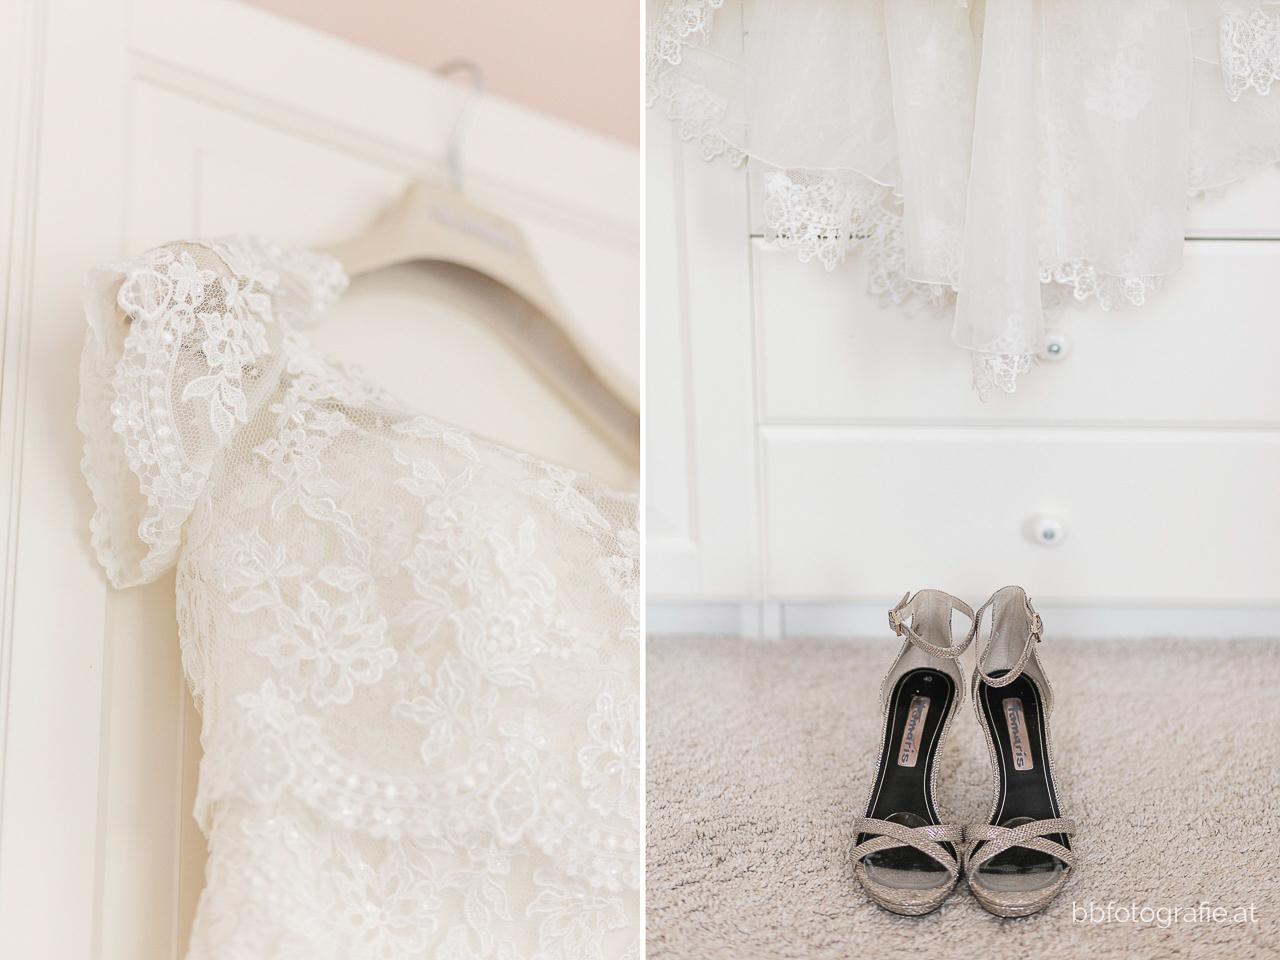 Hochzeitsfotograf, Hochzeitsfotograf Burgenland, Getting Ready, Bad Vöslau, Hotel Stefanie, Hochzeitslocation Burgenland, b&b fotografie